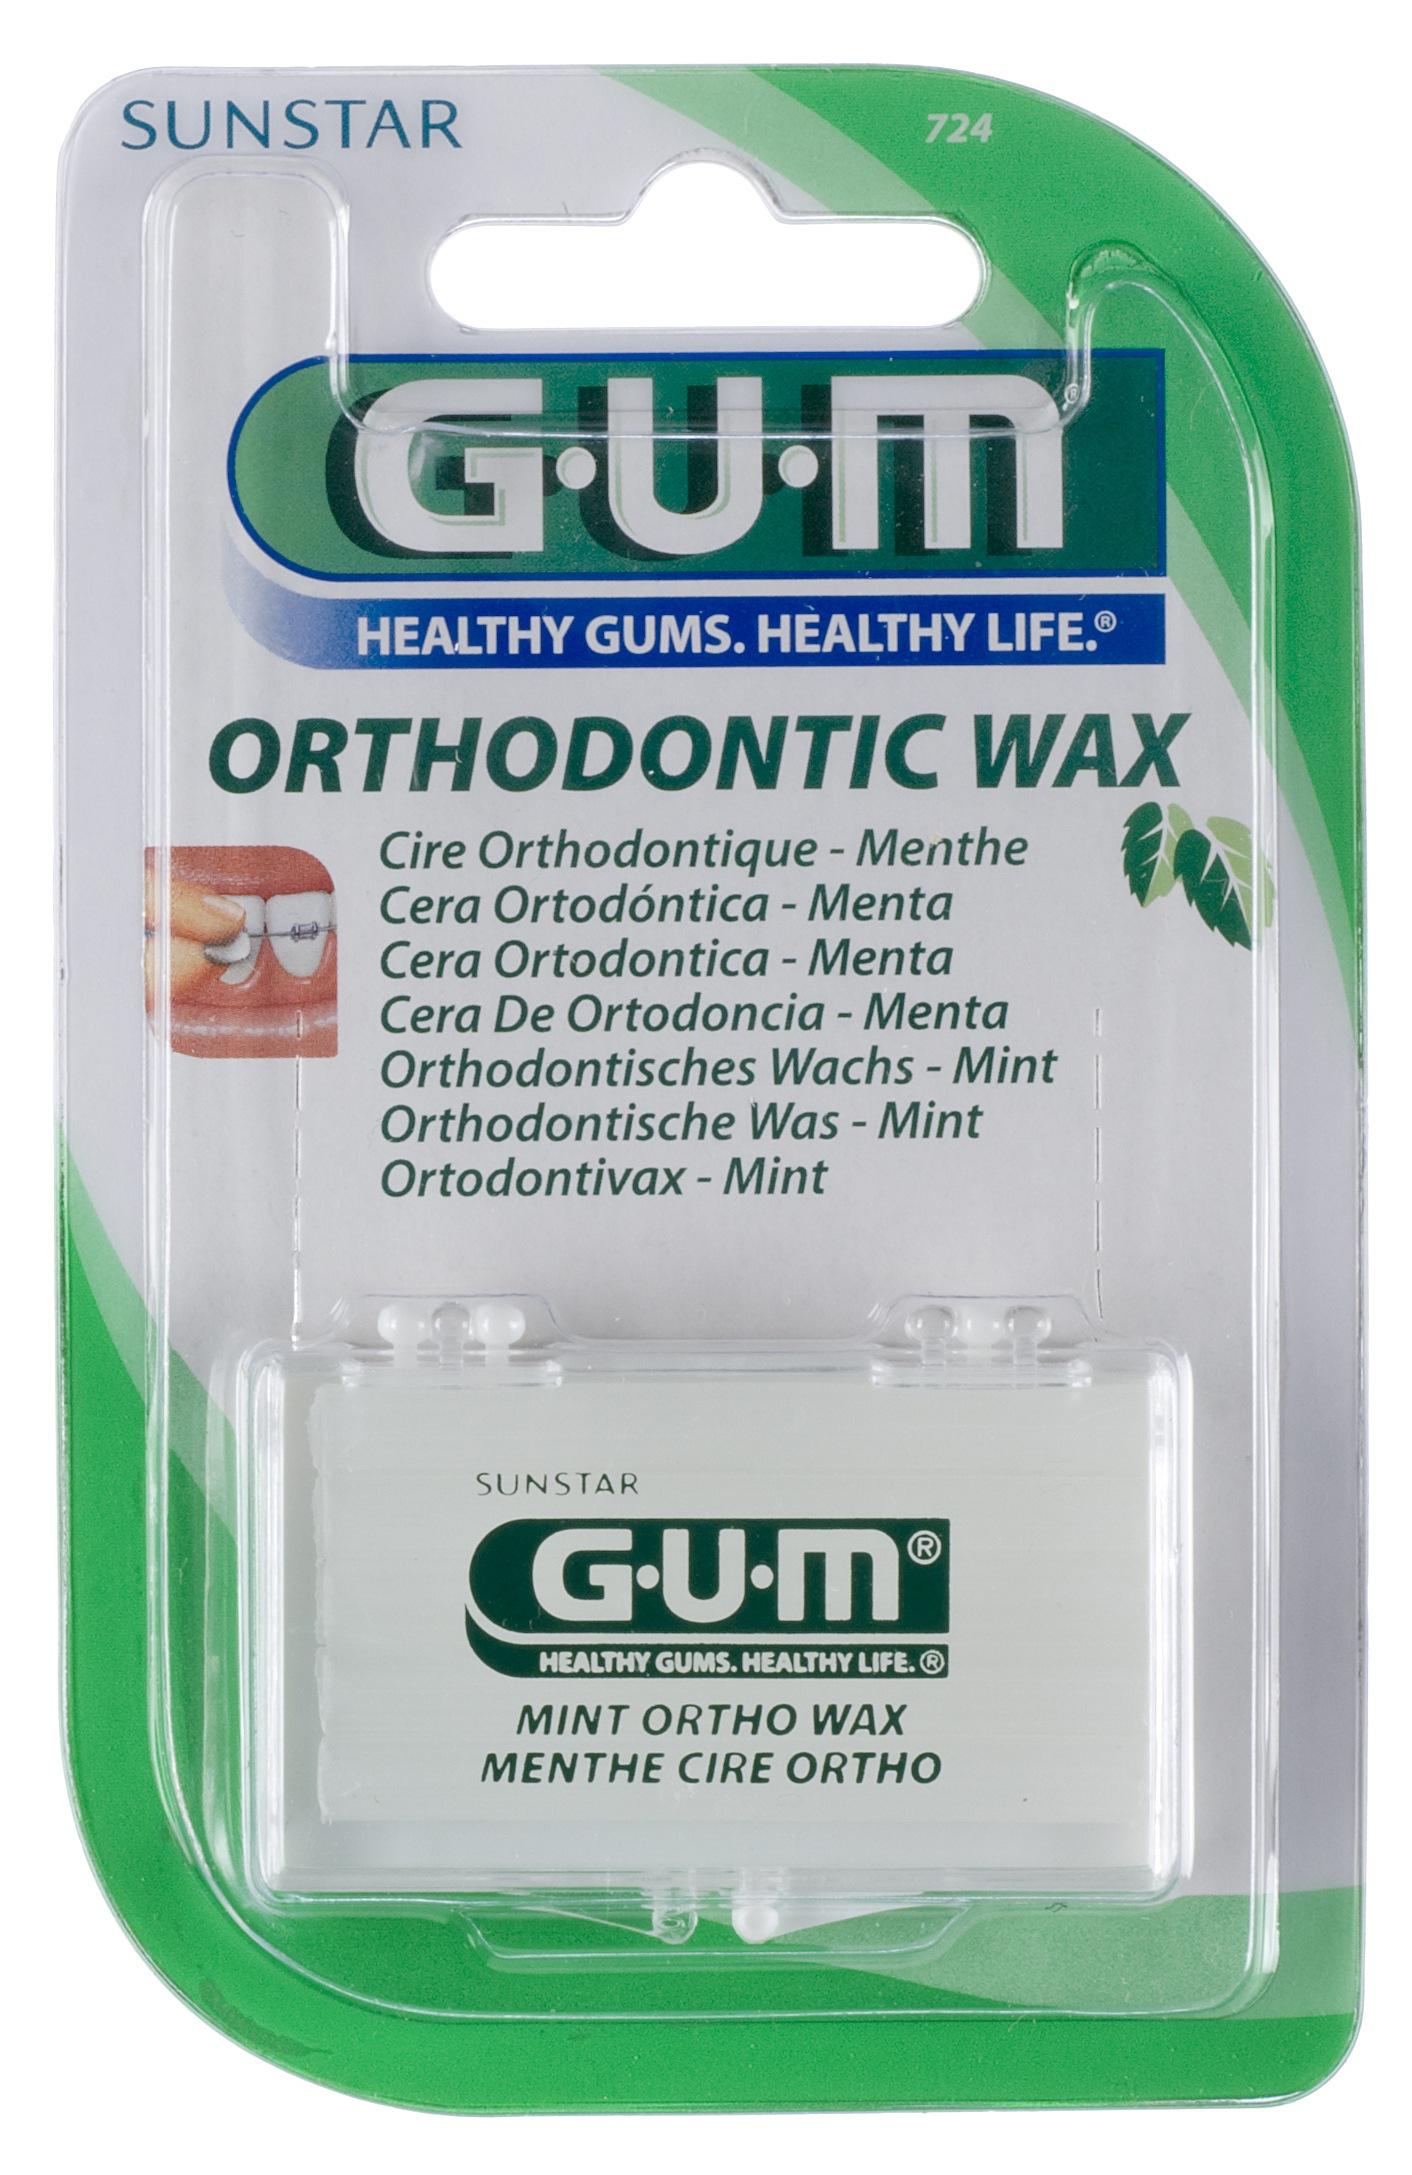 GUM Ortho+, voks, 5 stk